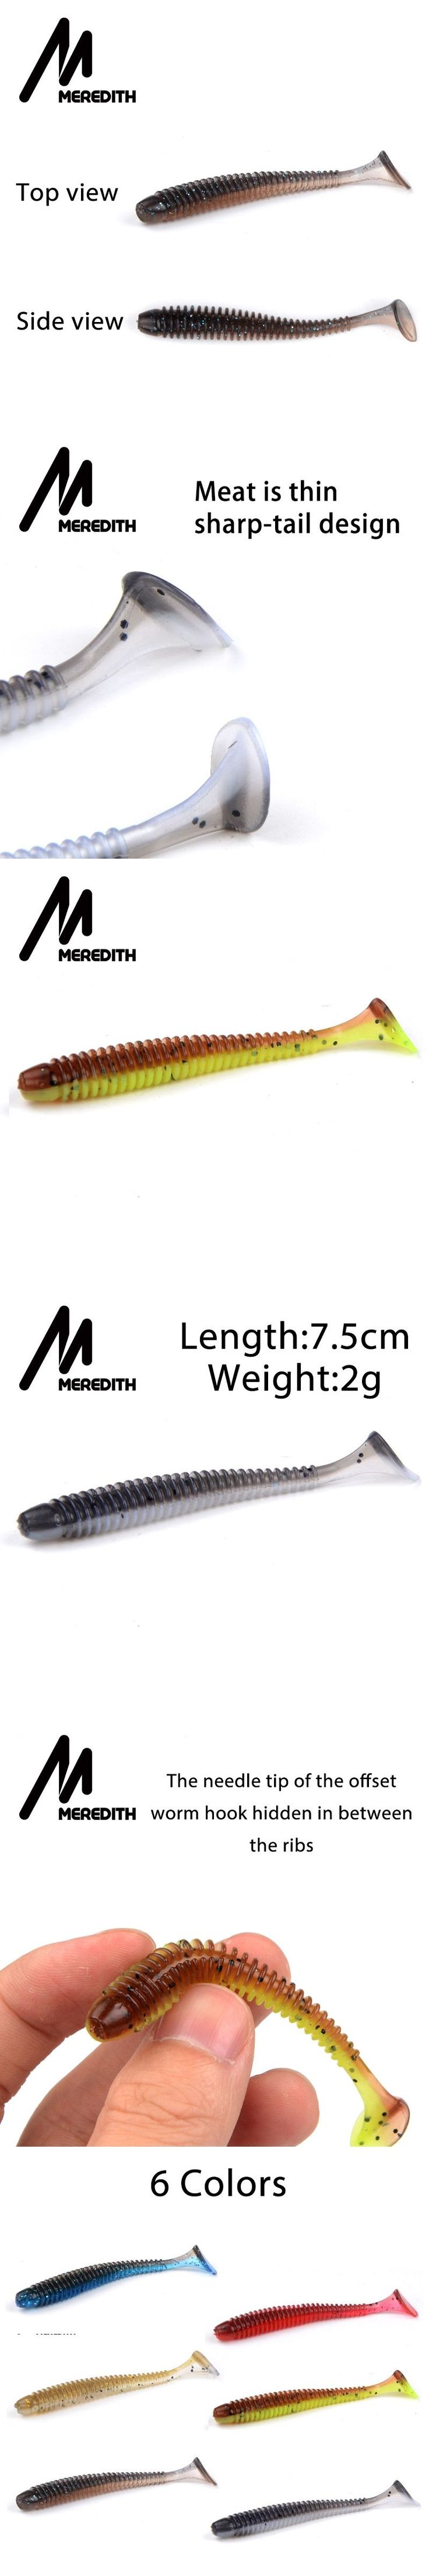 MEREDITH 75mm/2g 20pcs/Lot Fishing Lures Soft Lures Fishing Soft Bait Bass Bait Swimbait Craws Swing Impact